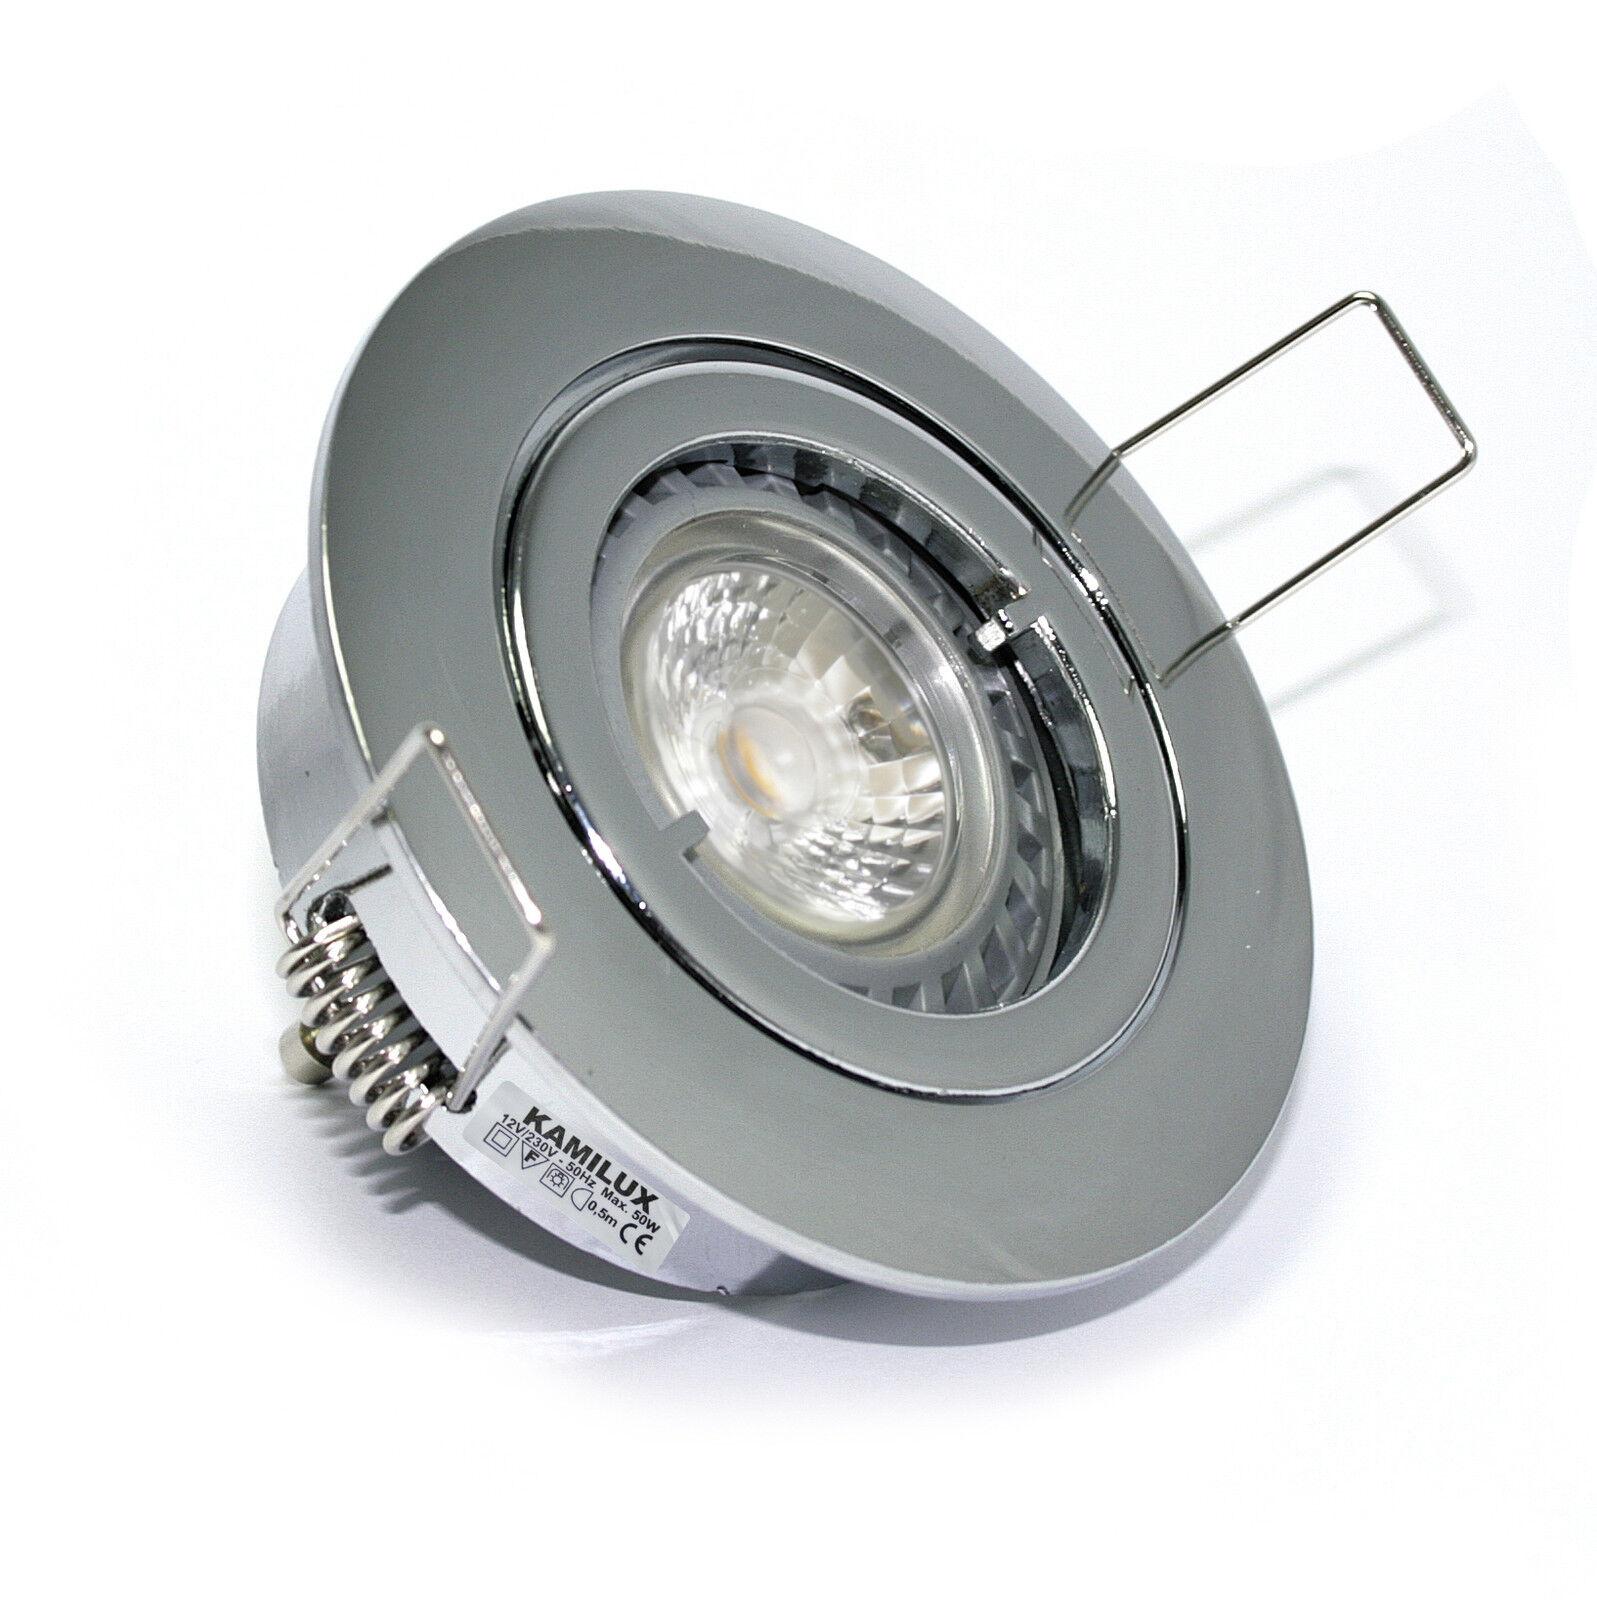 230V Bad Einbaustrahler Spot & GU10 5W HIGH POWER LED Leuchtmittel 5W = 50W hell